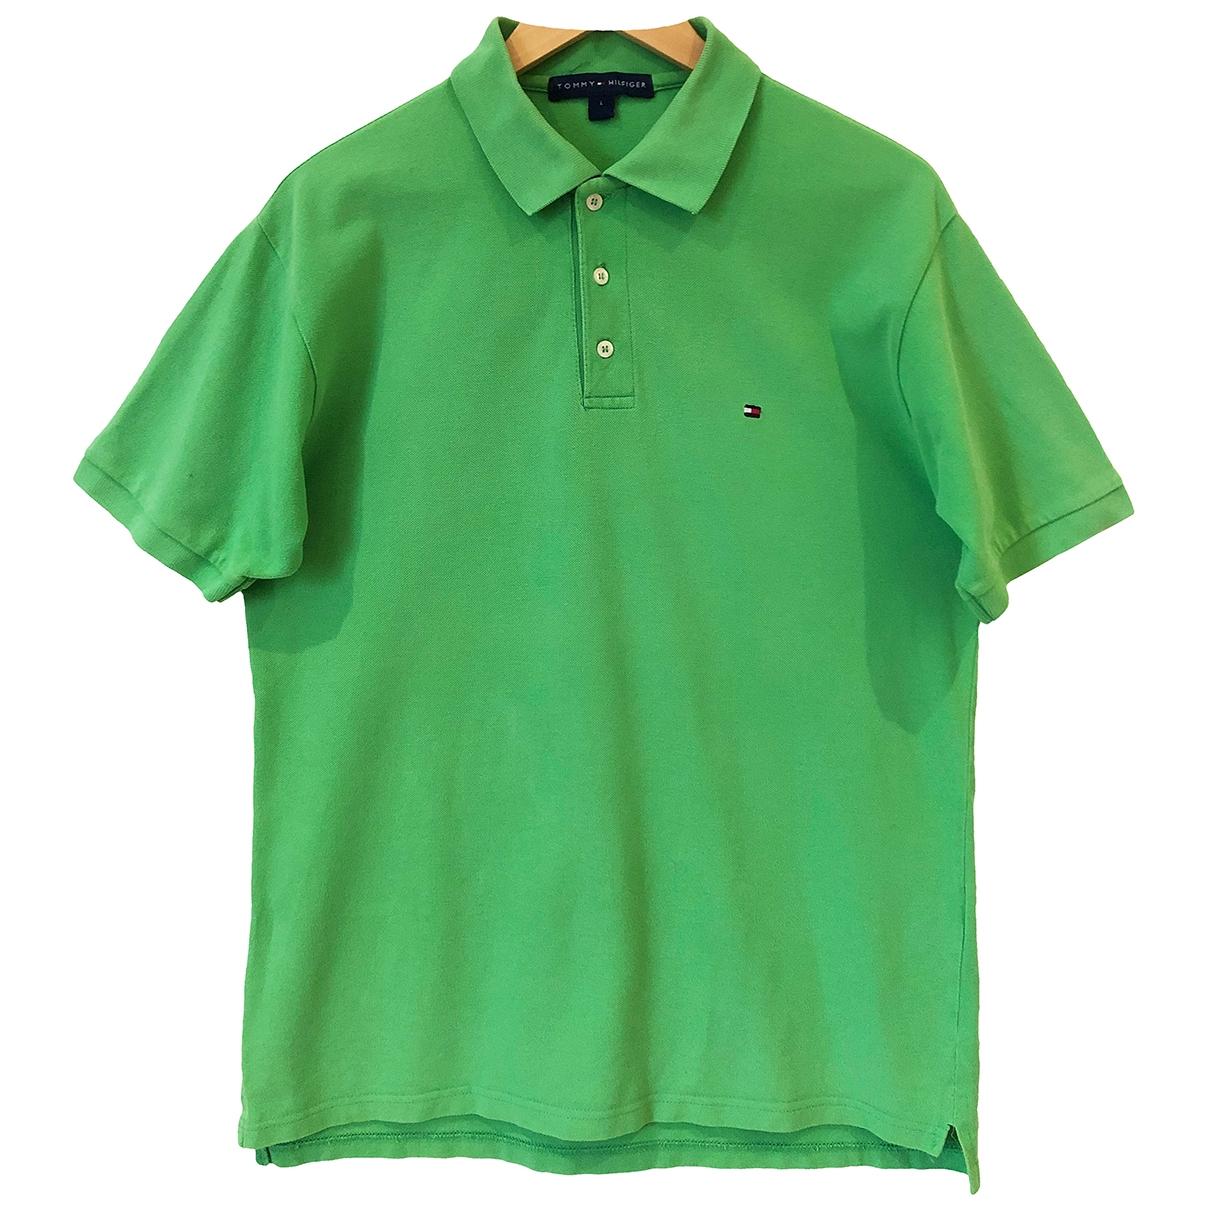 Polo en Algodon Verde Tommy Hilfiger